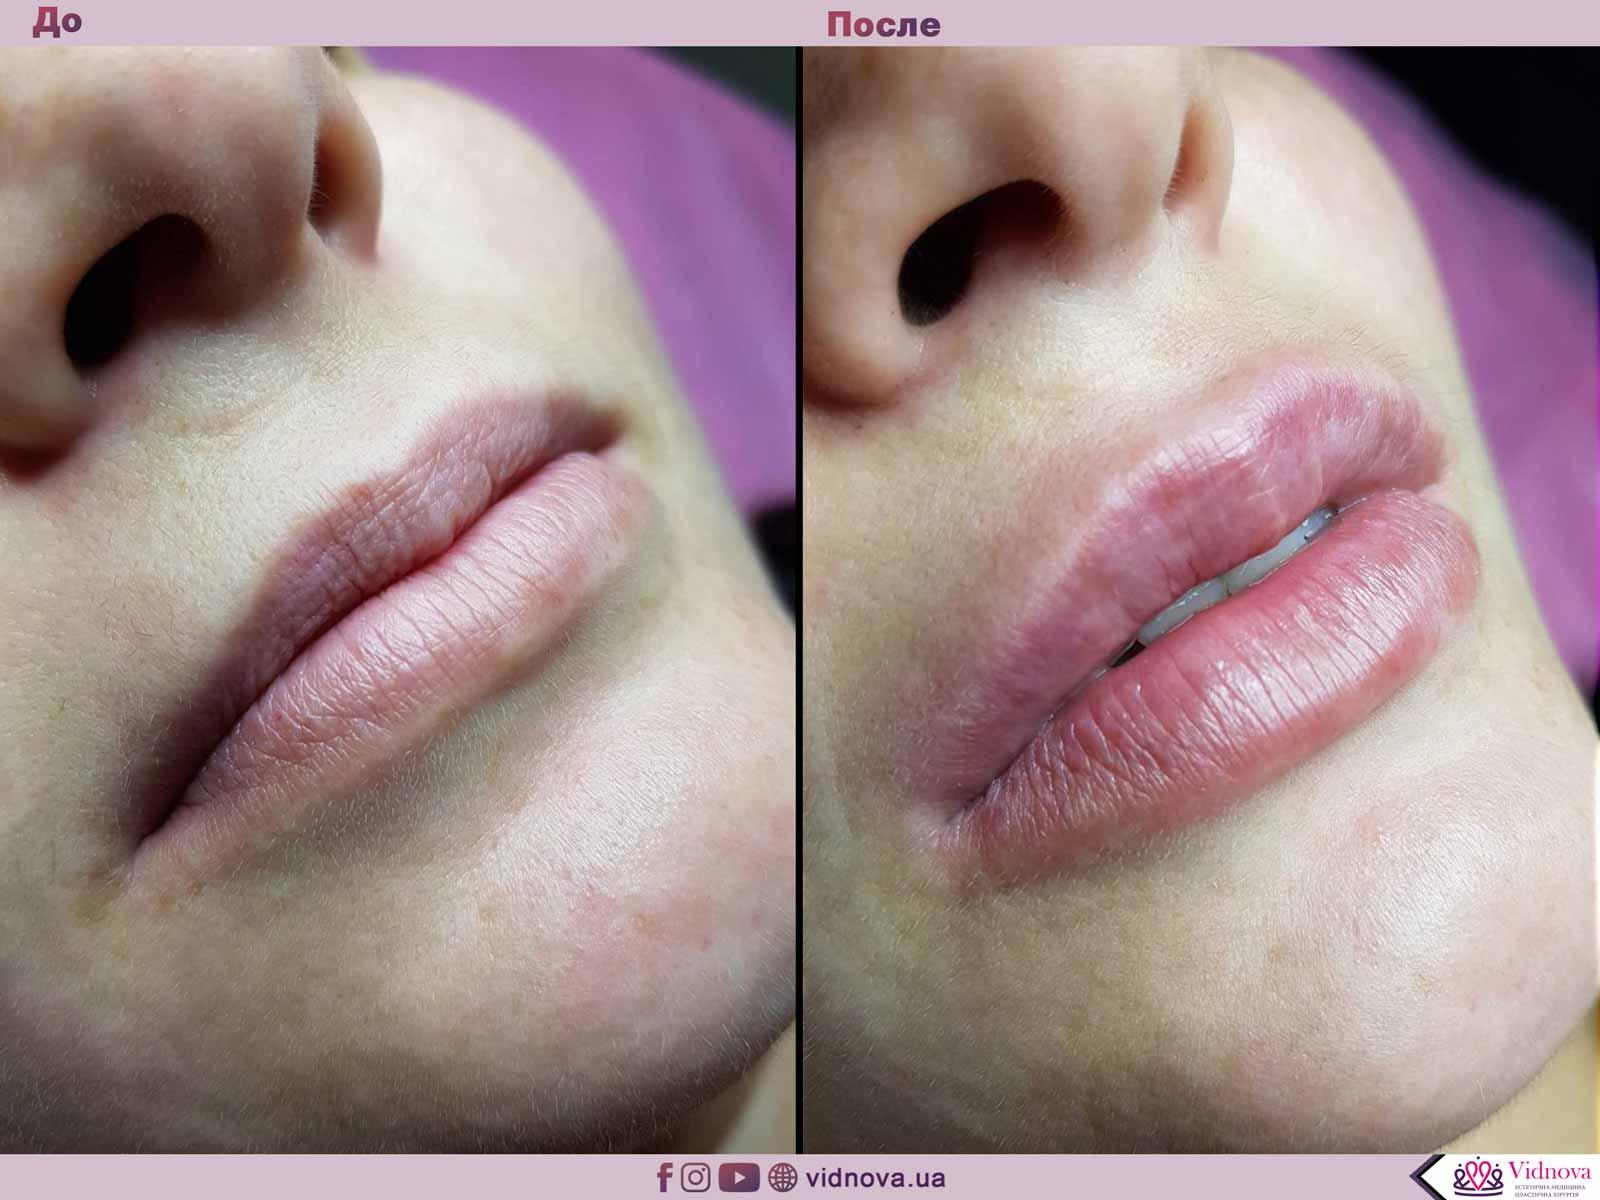 Увеличение губ: Фото До и После - Пример №14-1 - Клиника Vidnova